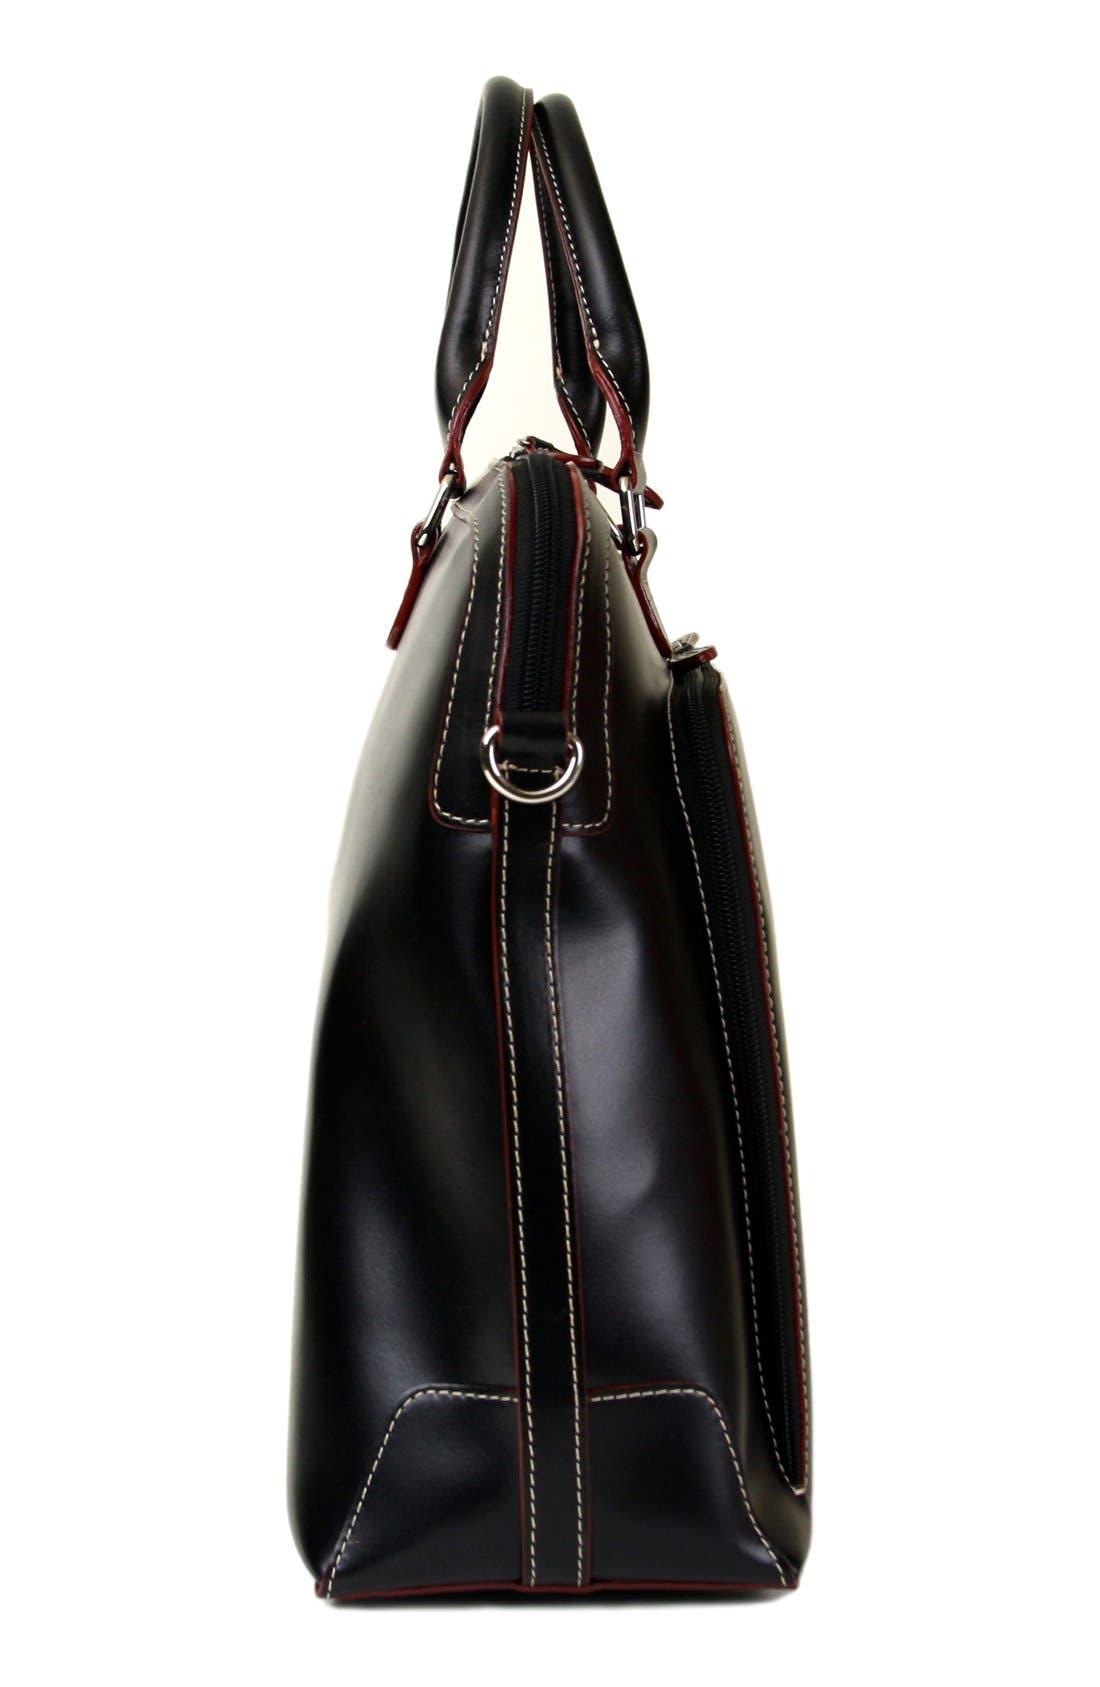 Lodis 'Audrey Brera' Leather Briefcase,                             Alternate thumbnail 9, color,                             001